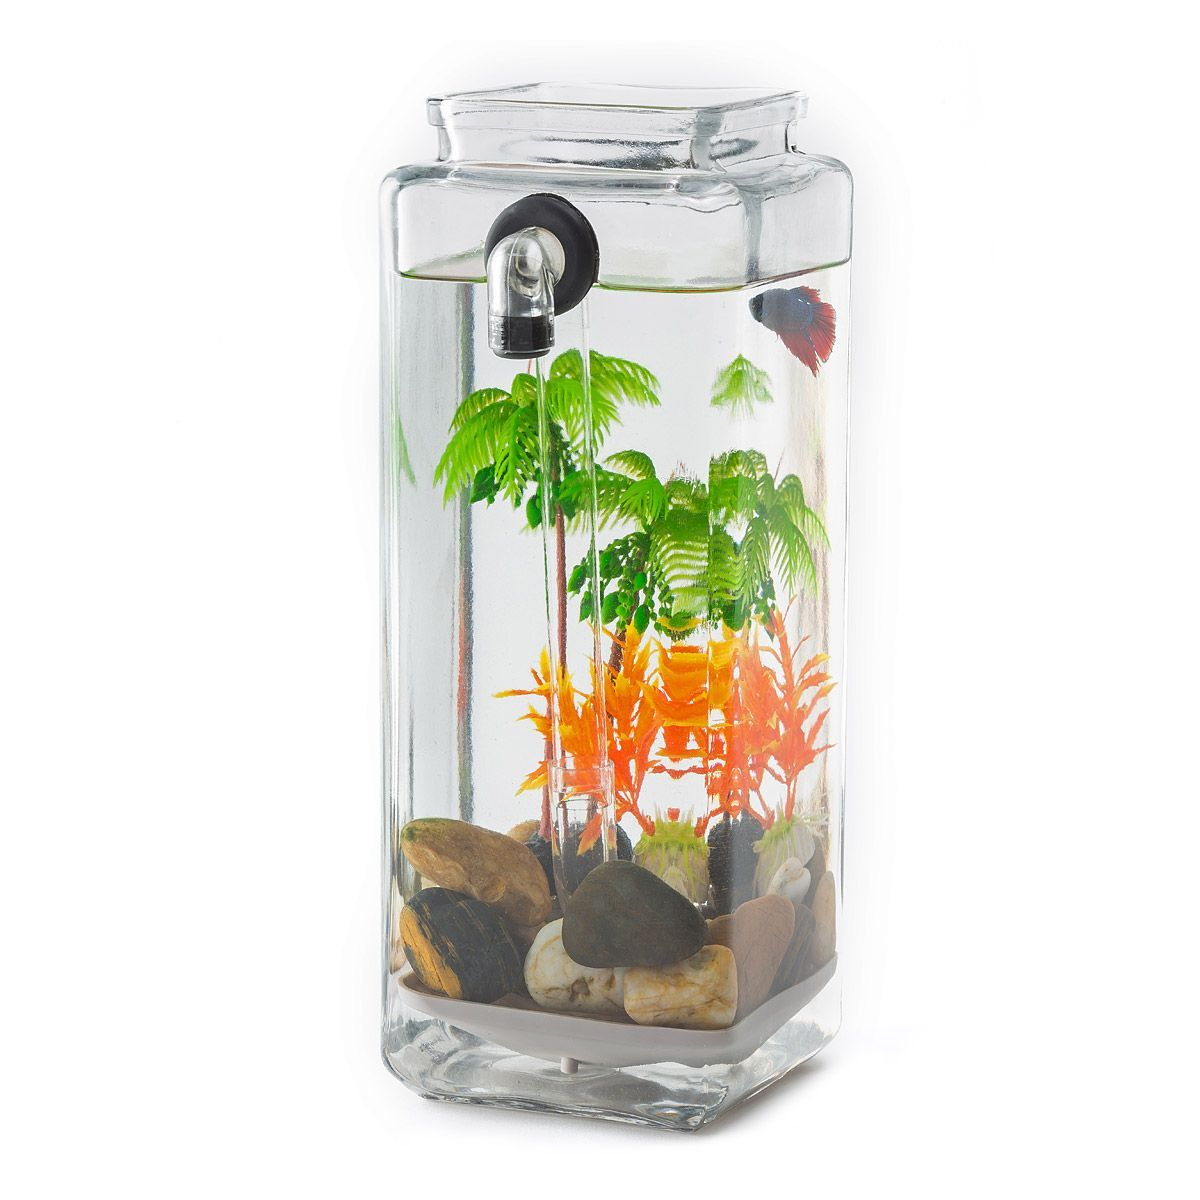 No Clean Aquarium acrylic fish tank, freshwater, no